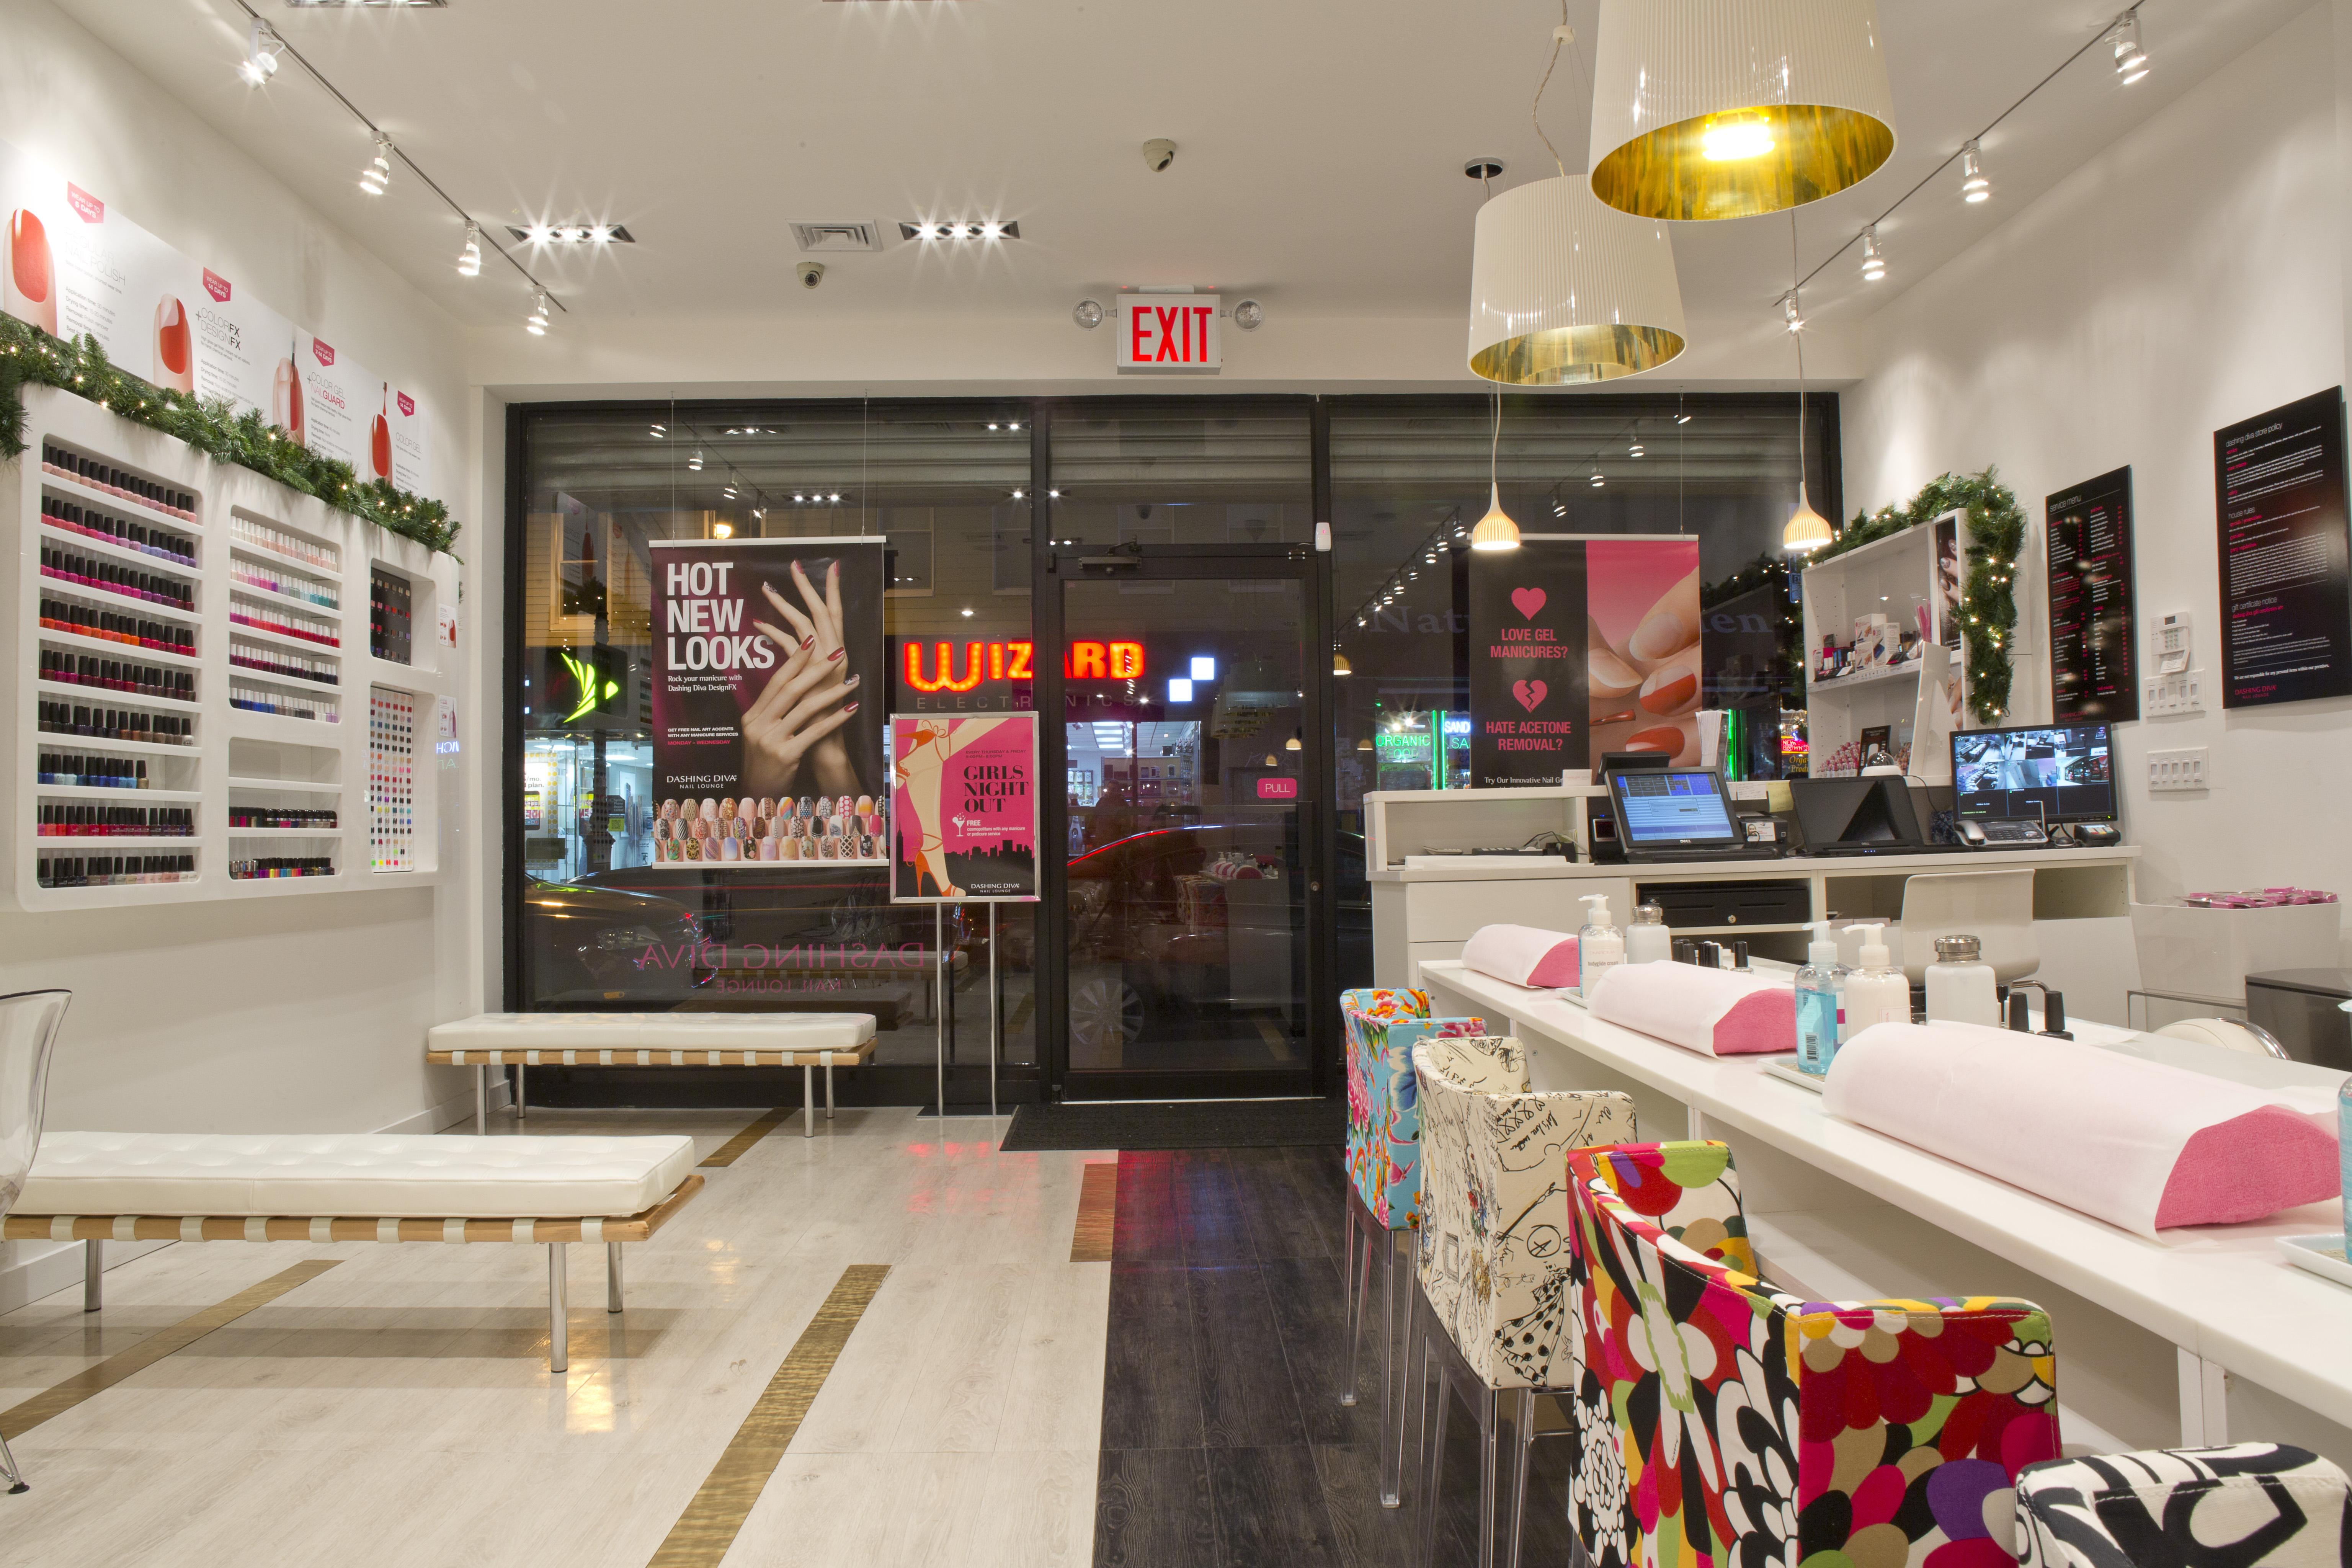 Dashing Diva Nail Lounge 753 Manhattan Ave, Brooklyn, NY 11222 - YP.com